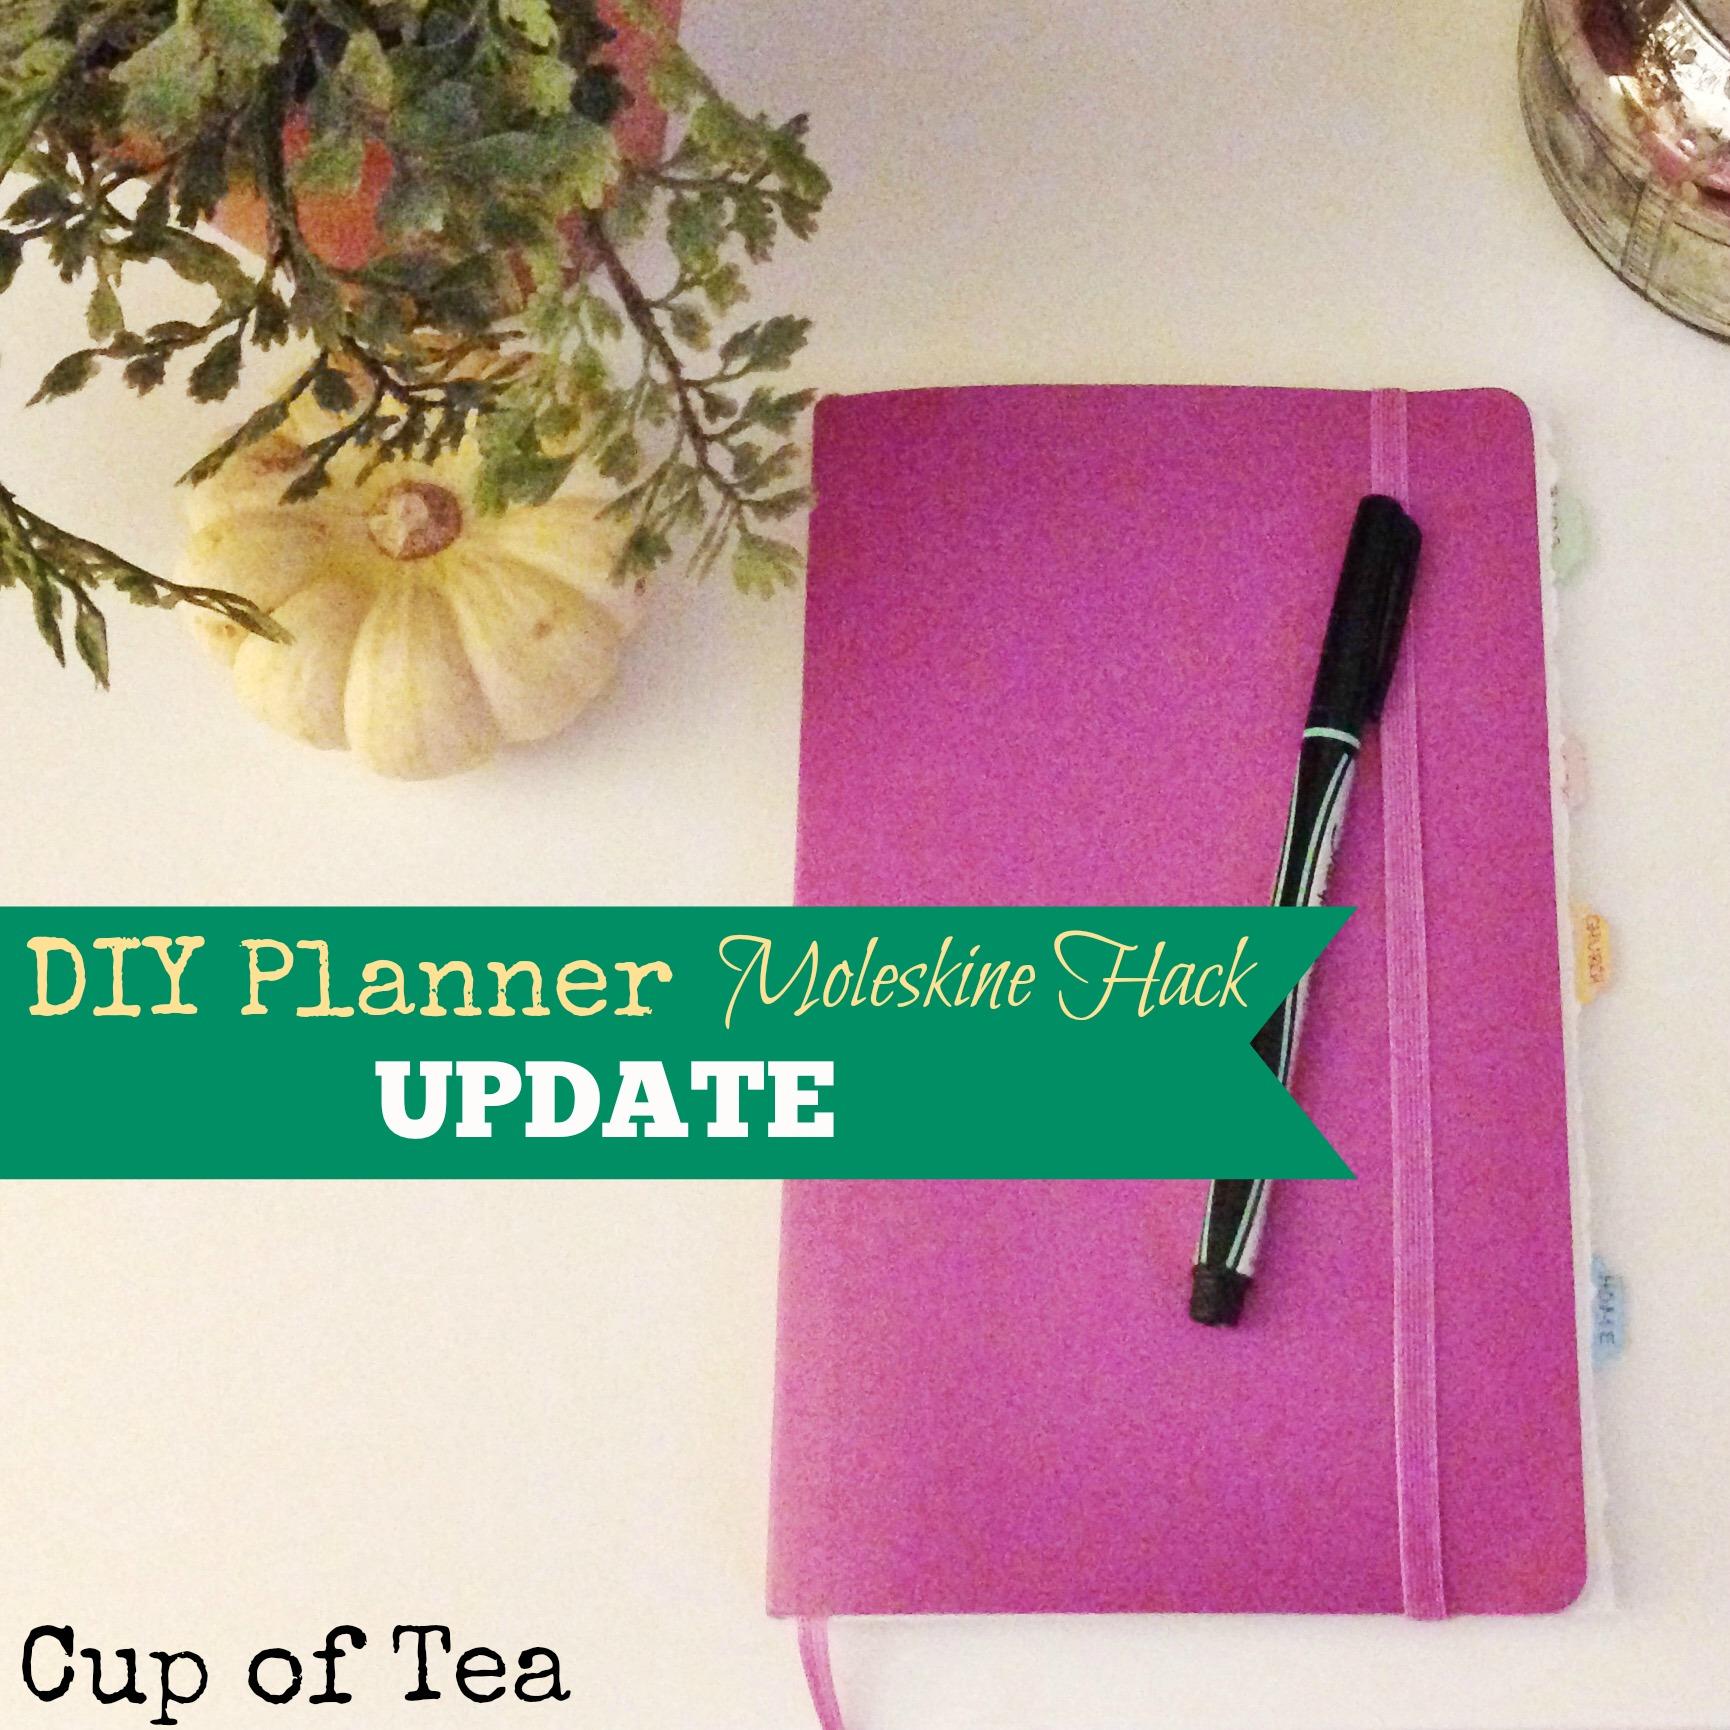 DIY Planner   Moleskine Hack UPDATE   Cup of Tea